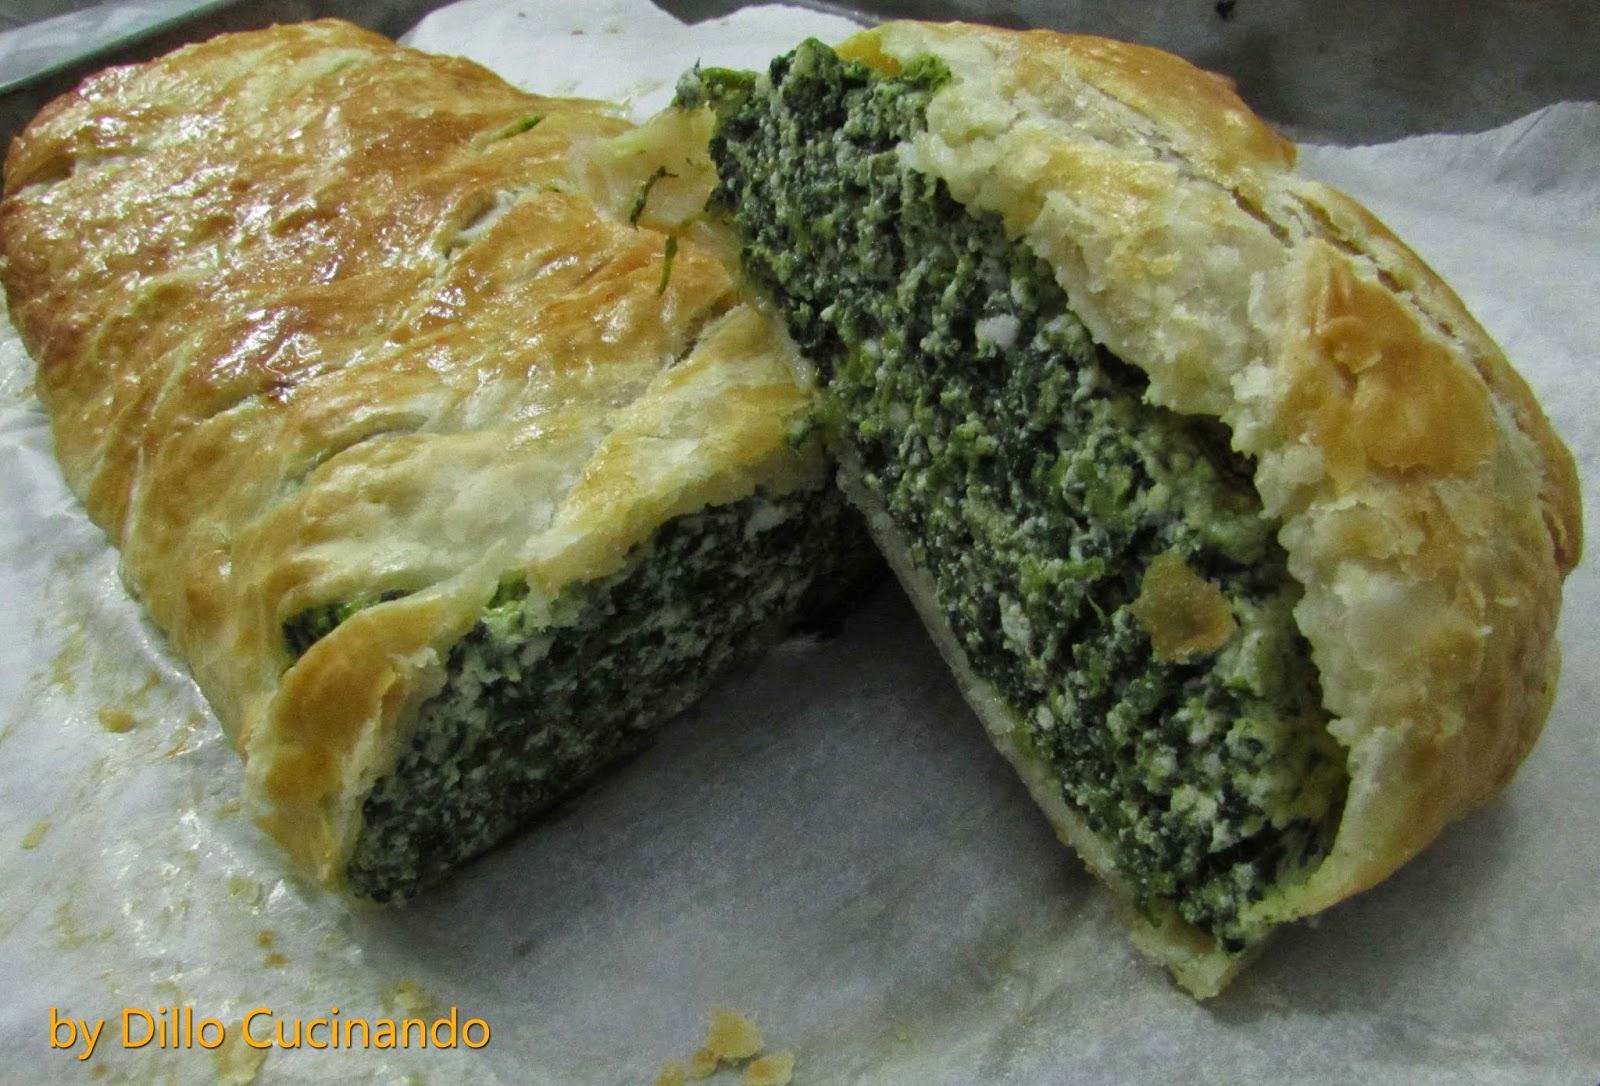 Torta rustica di ricotta e spinaci